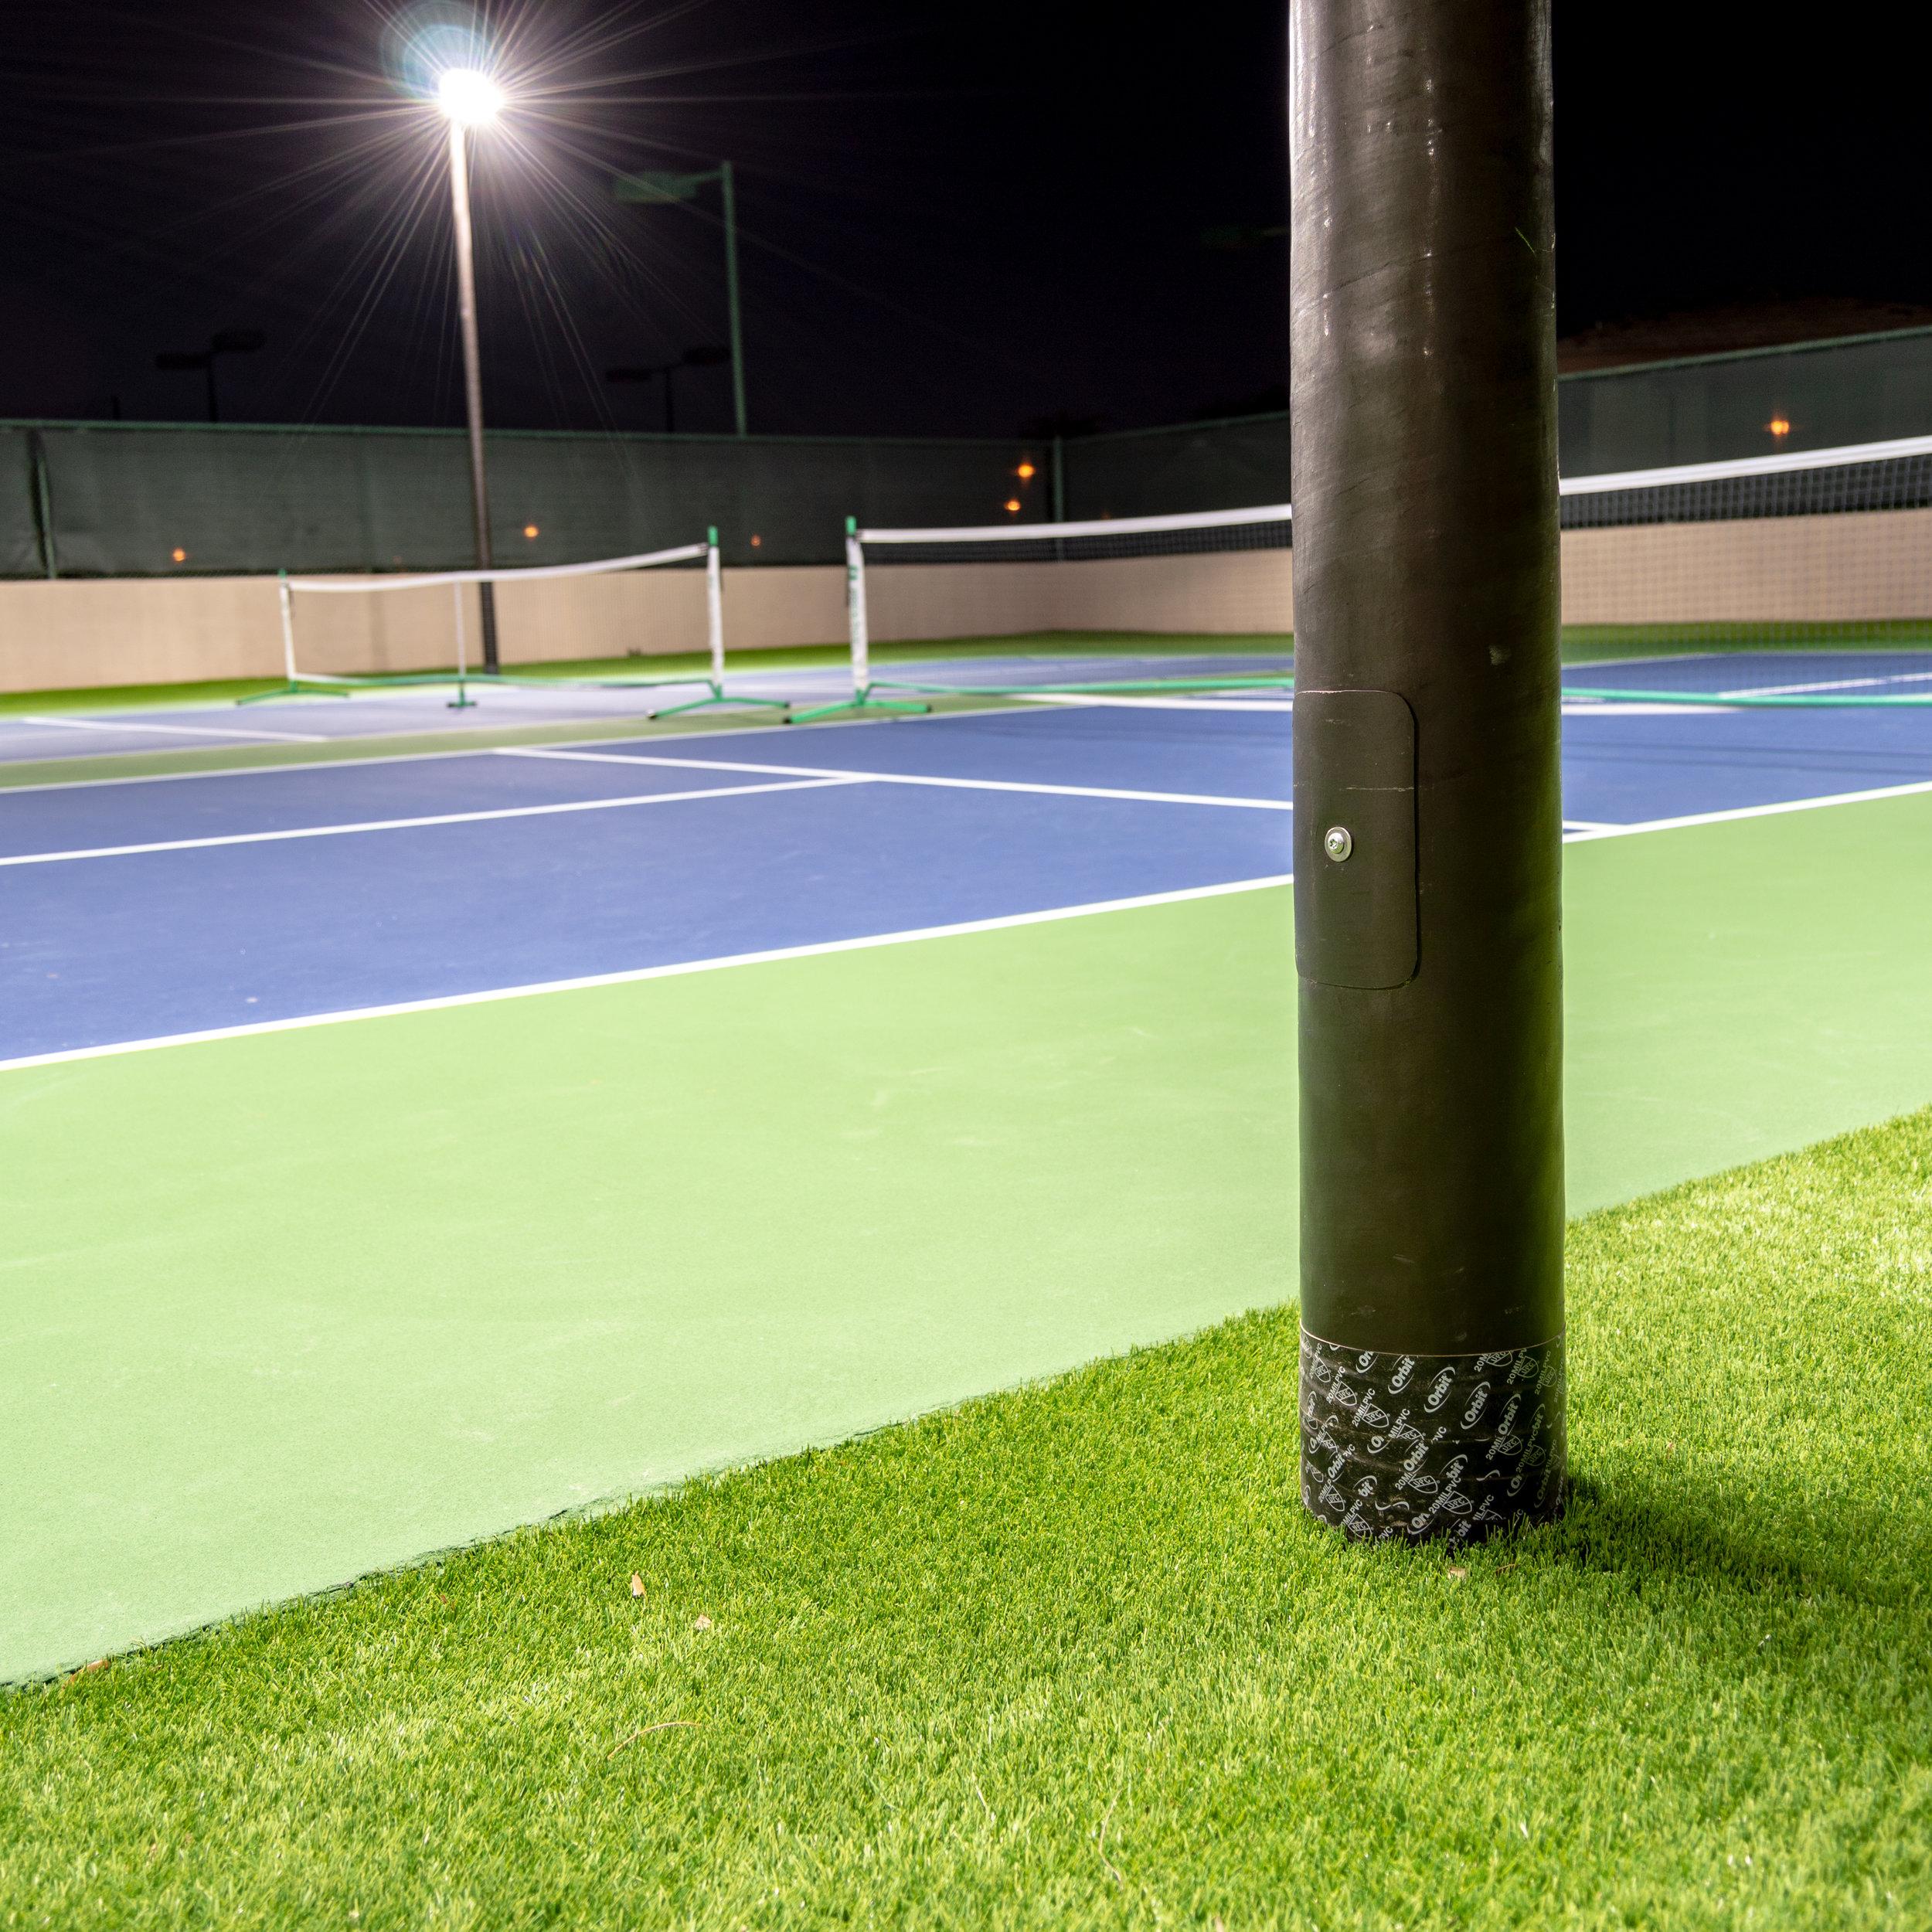 courts8-sq.jpg